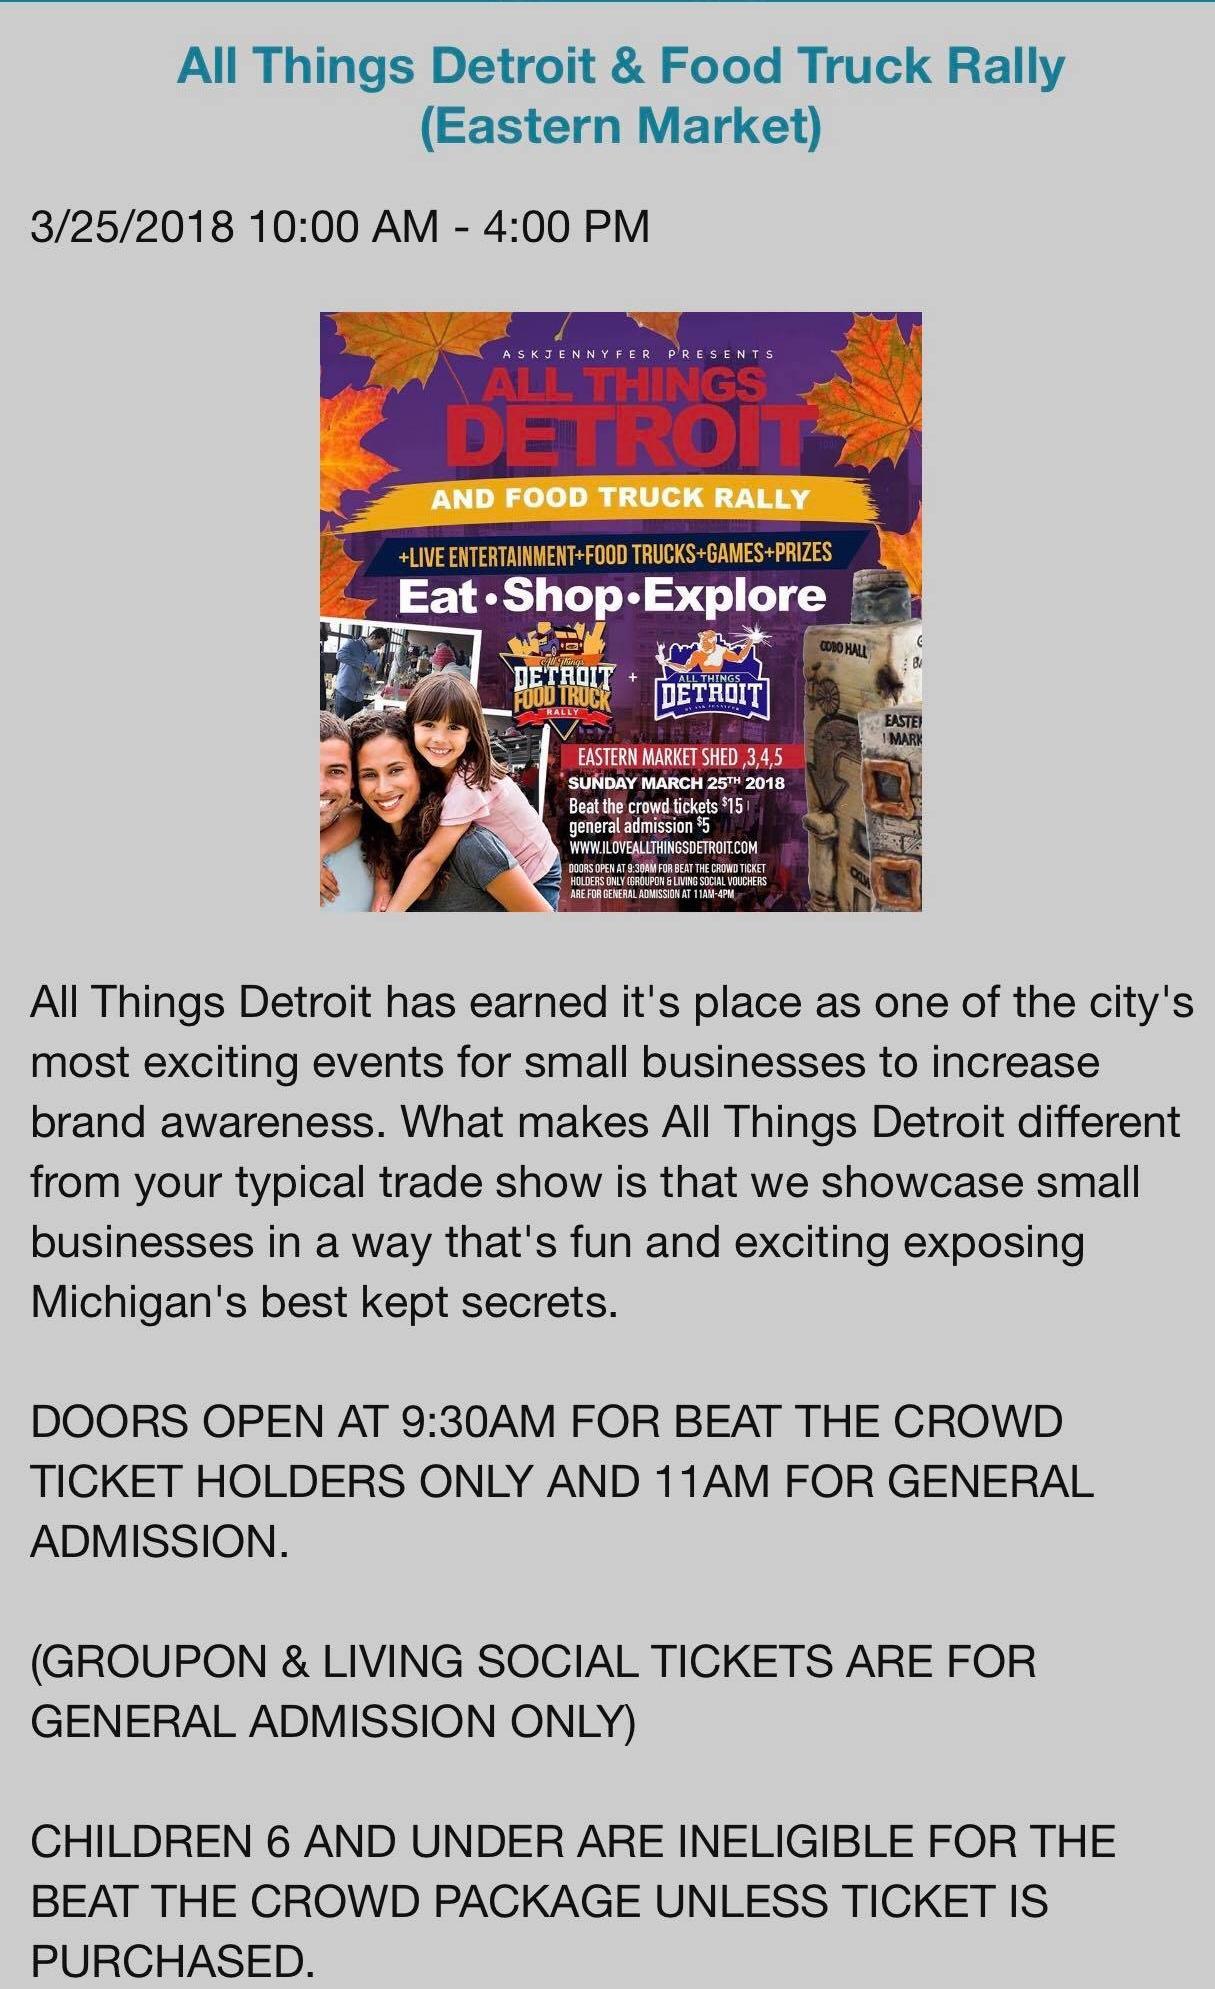 Eastern Market Corporation   2934 Russell St, Detroit, Michigan 48207